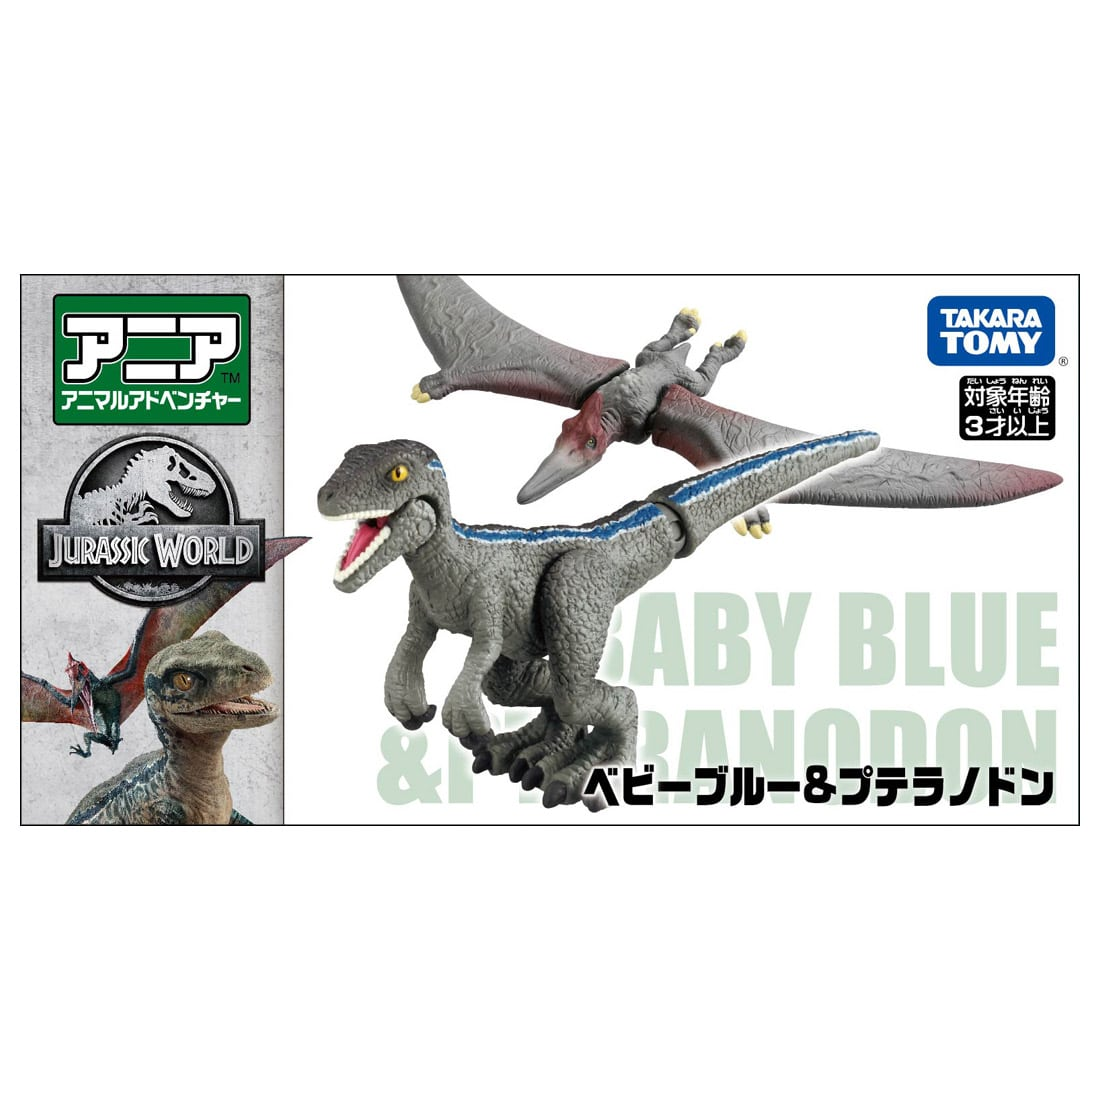 TOMY動物模型 侏儸紀世界 blue